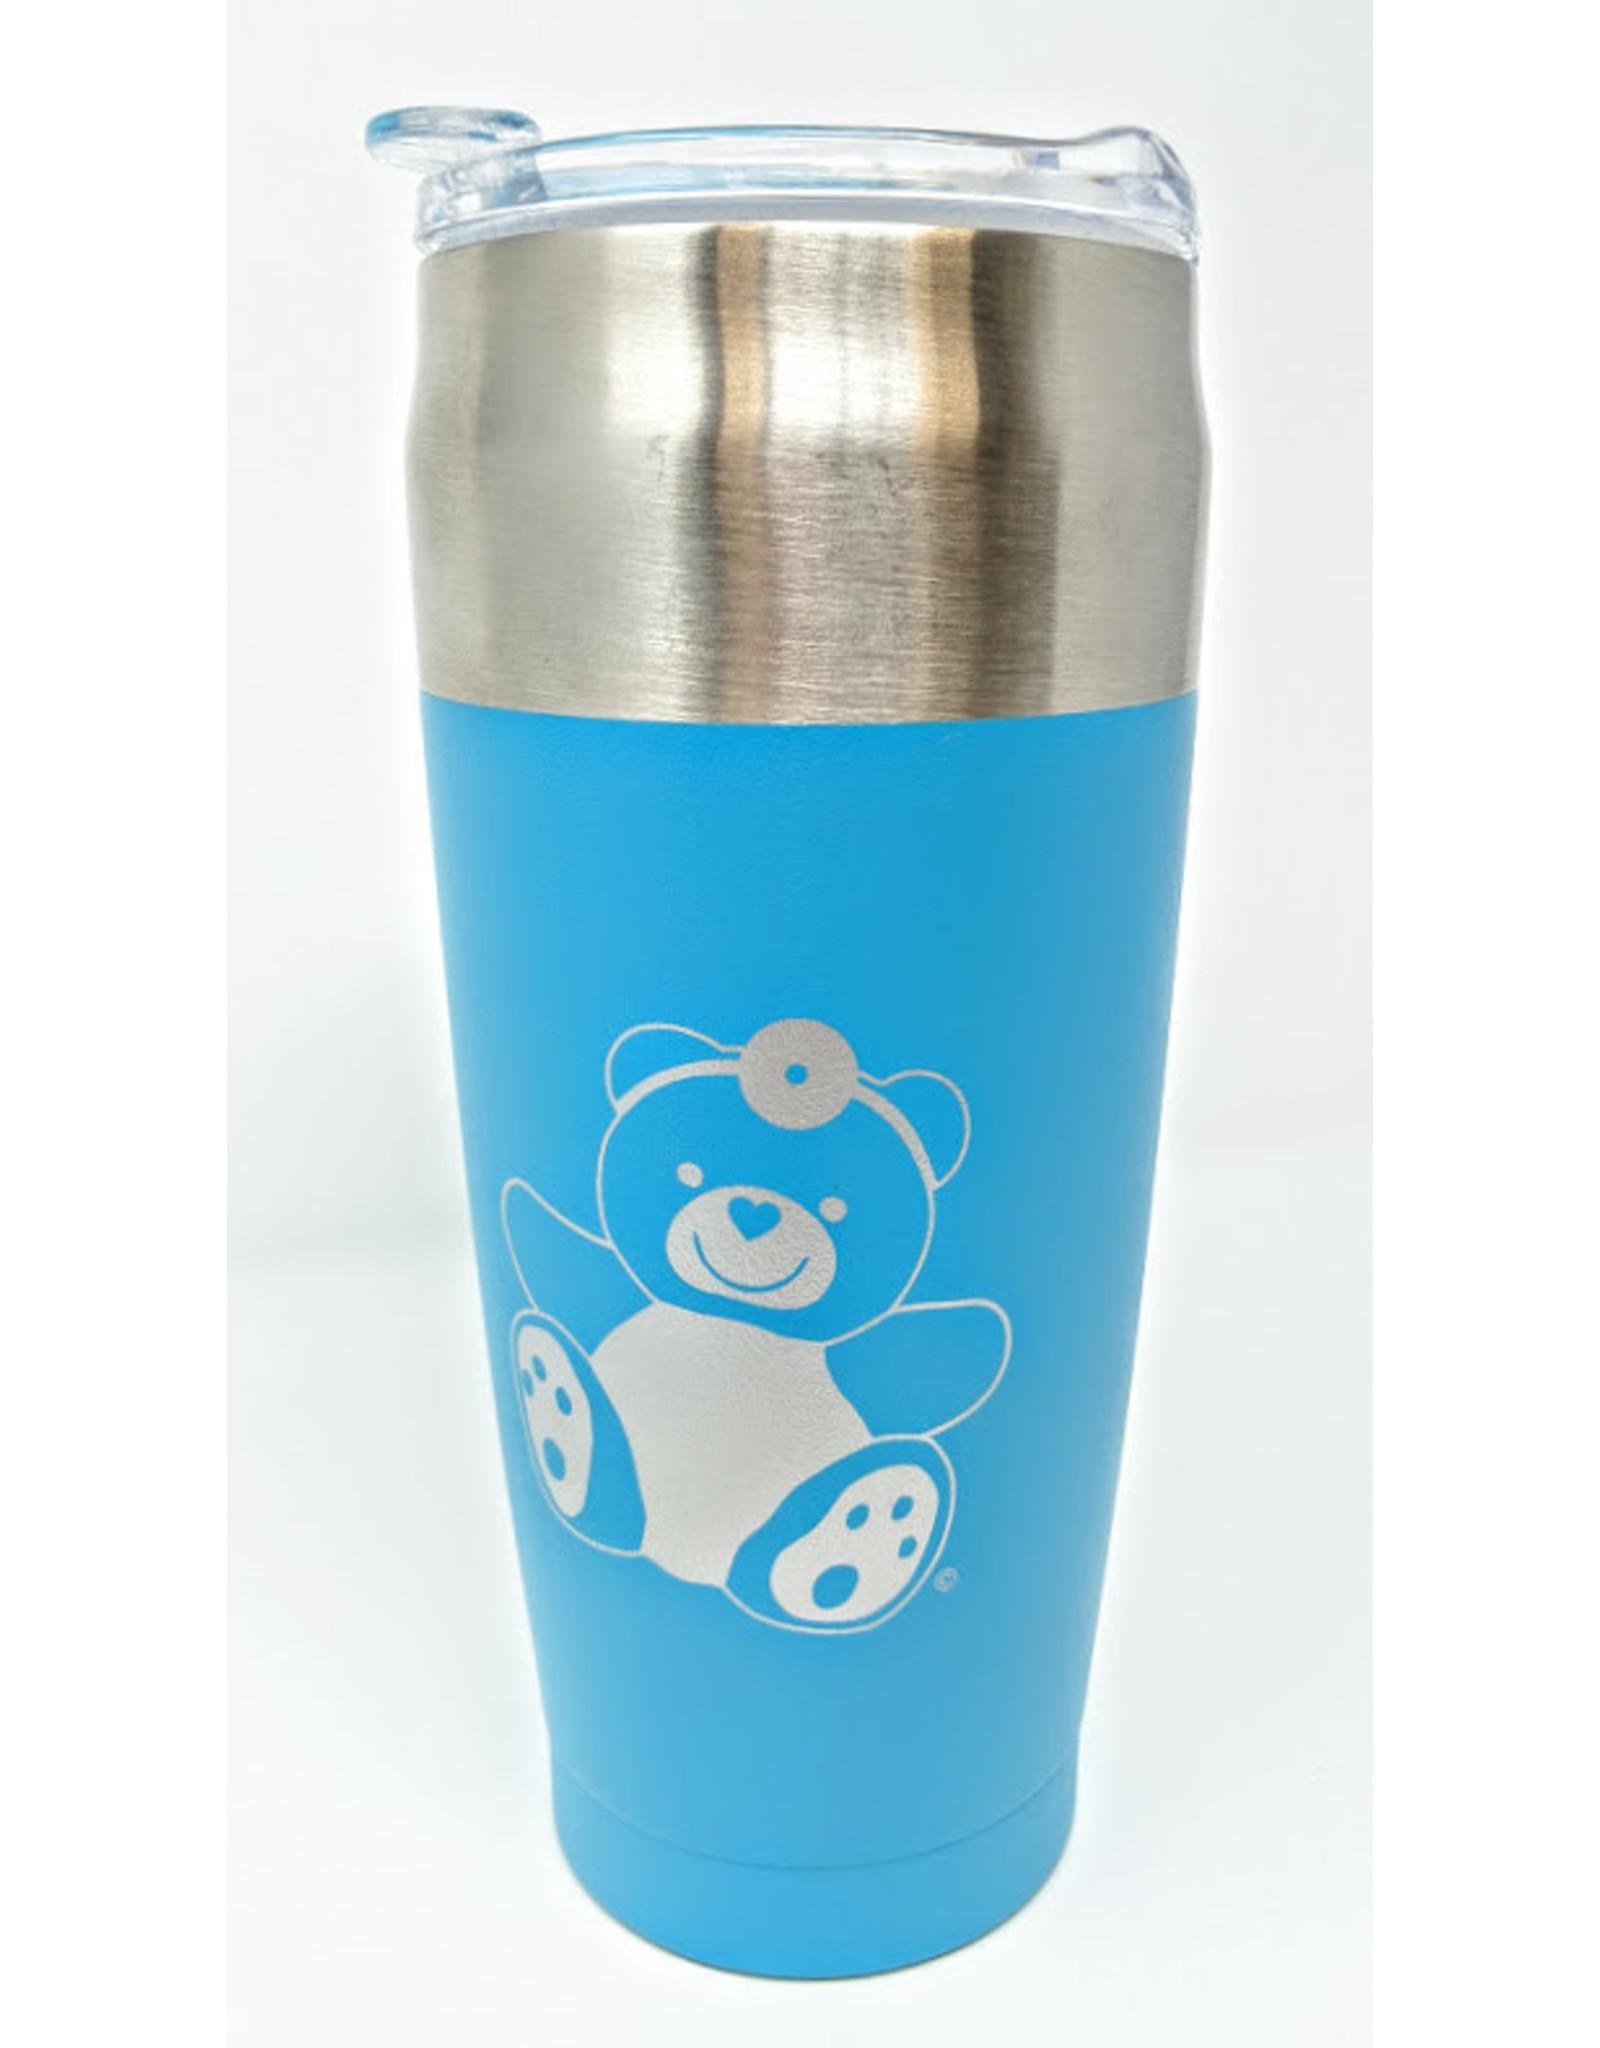 Stollery Travel Mug - teal